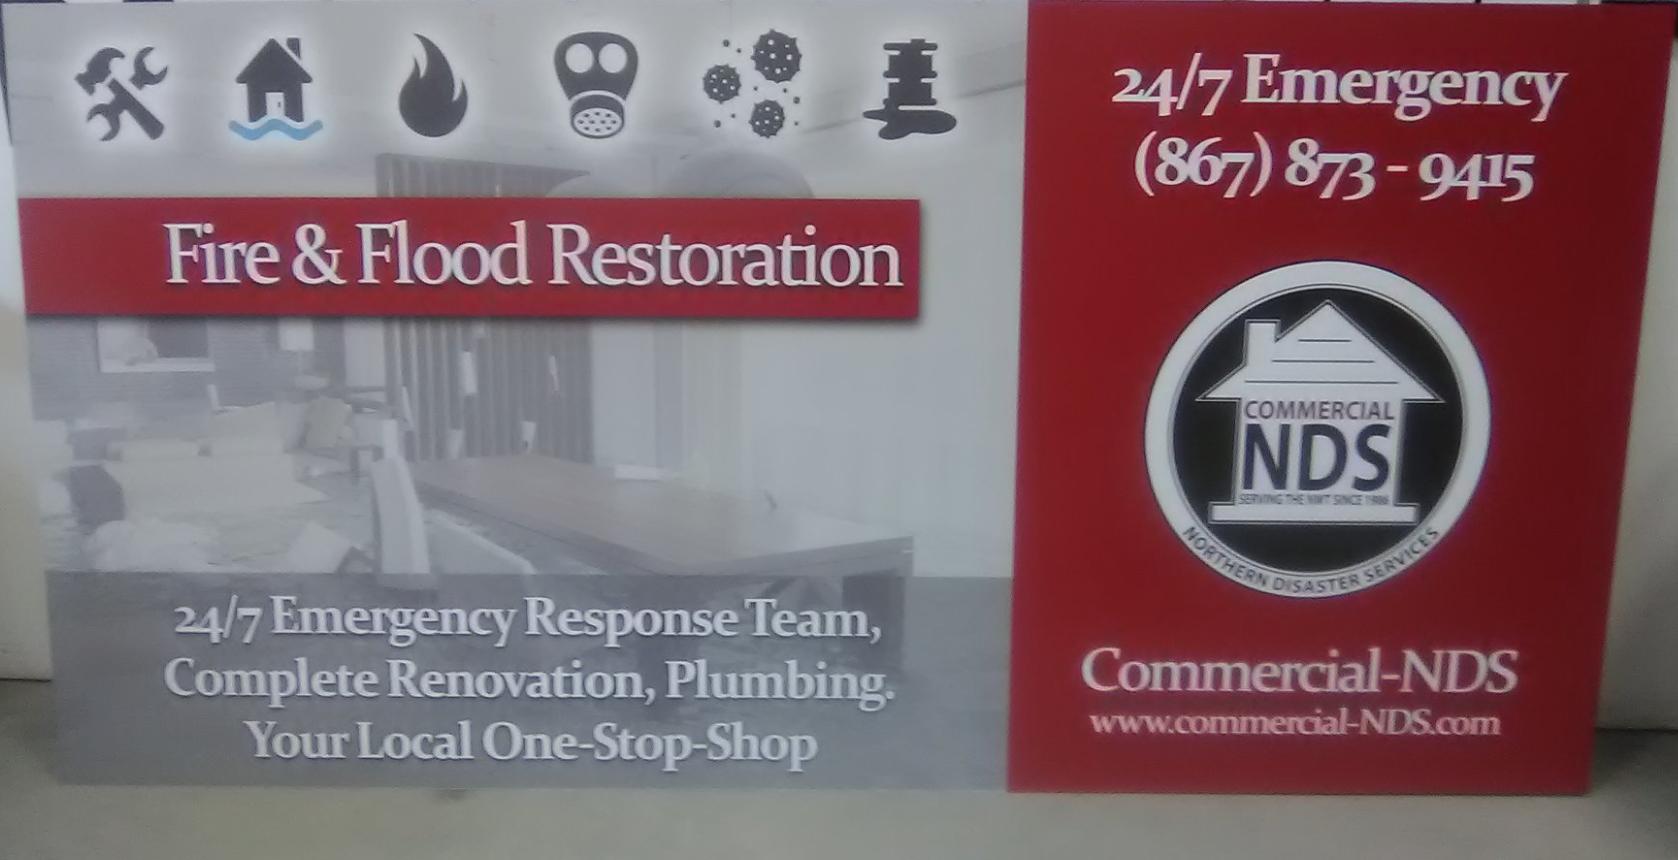 Exterior Signage Advertisement